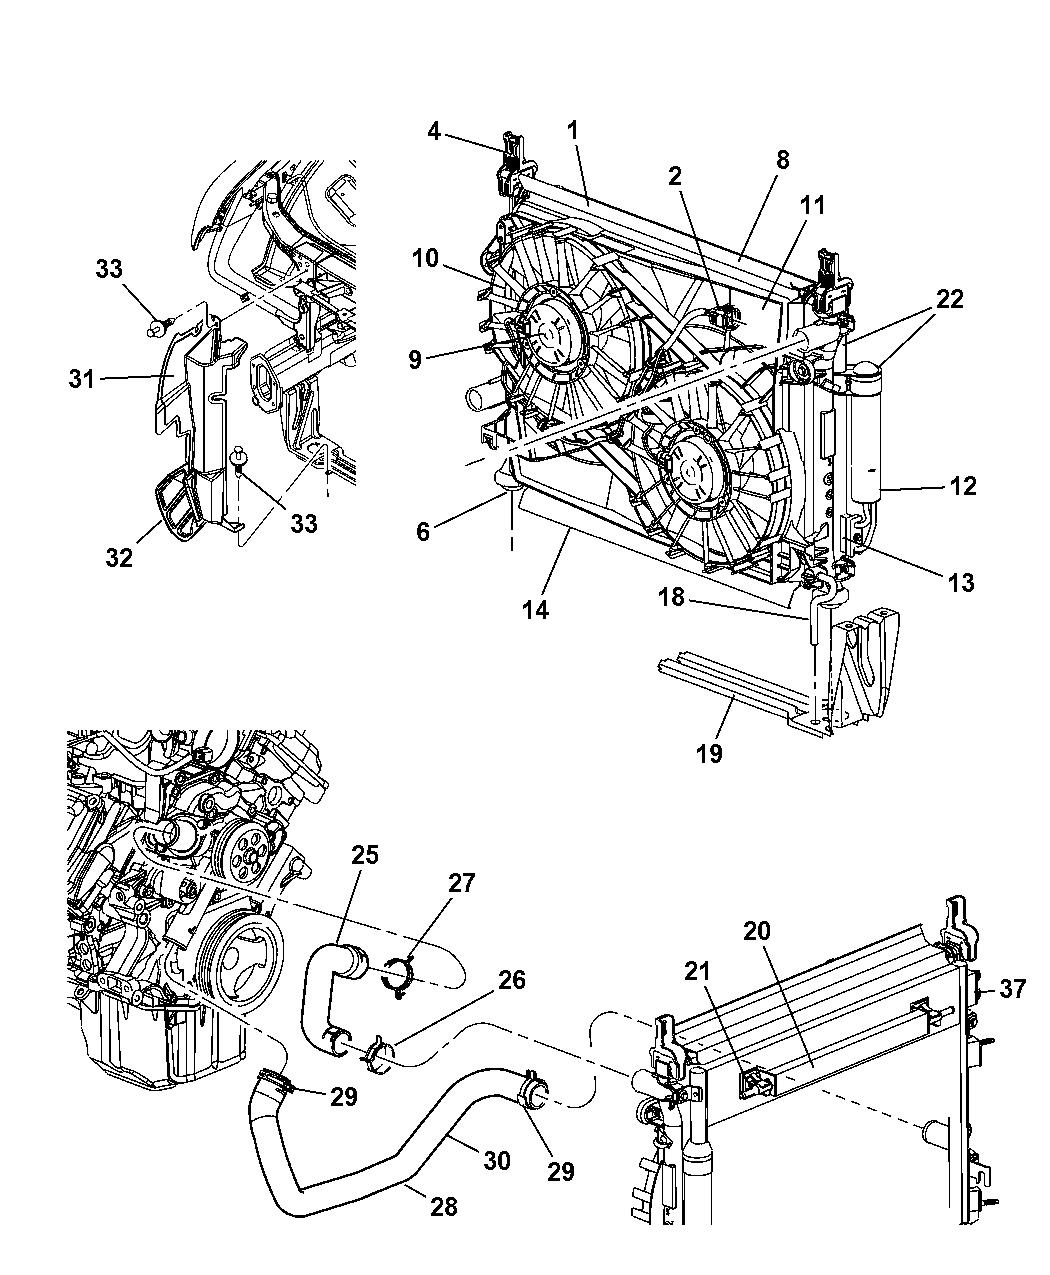 Strange 2007 Dodge Magnum Engine Coolant Diagram Wiring Library Wiring Digital Resources Remcakbiperorg